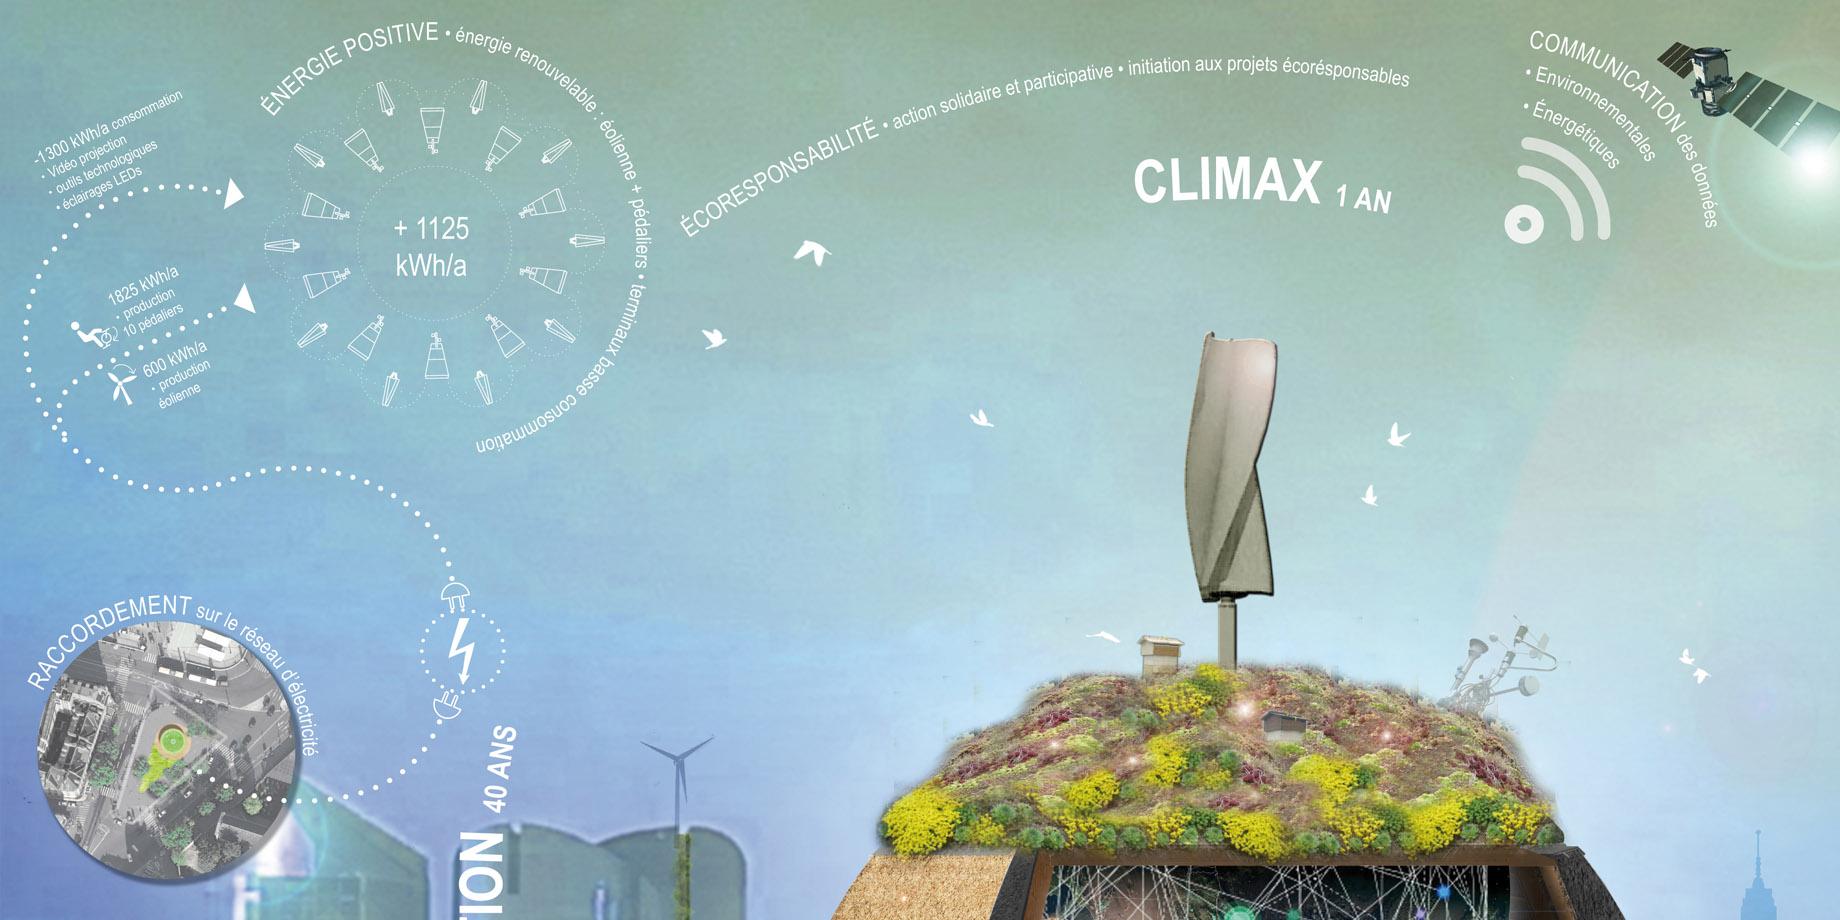 maskarade-architecture-concours-paris-COP21-ecodrome-bepos-ecoconstruction-2015-1840